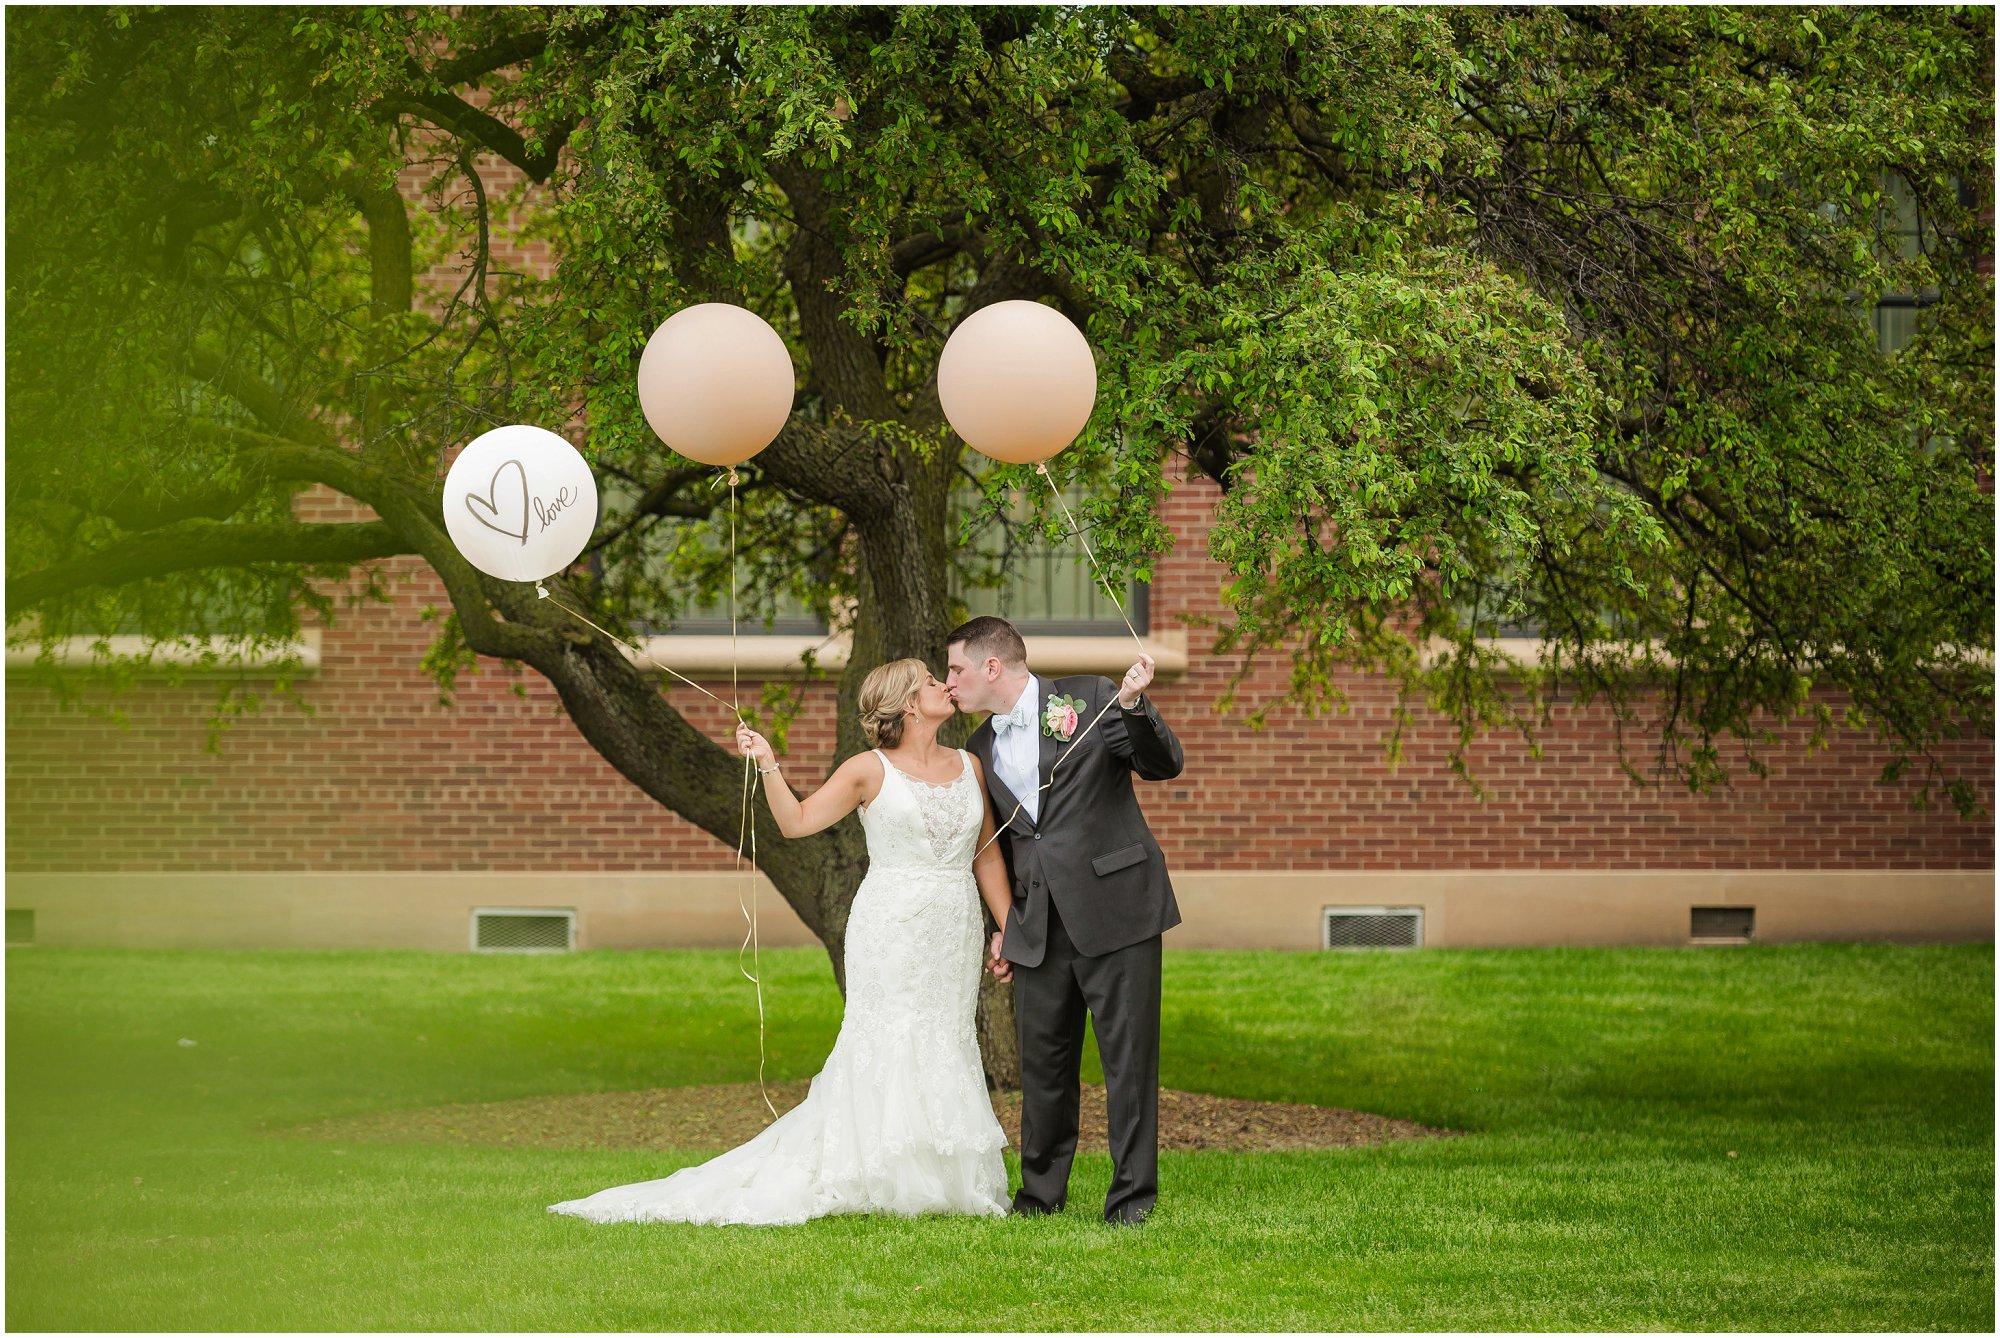 Plymouth_michigan_wedding_photographer_0426.jpg